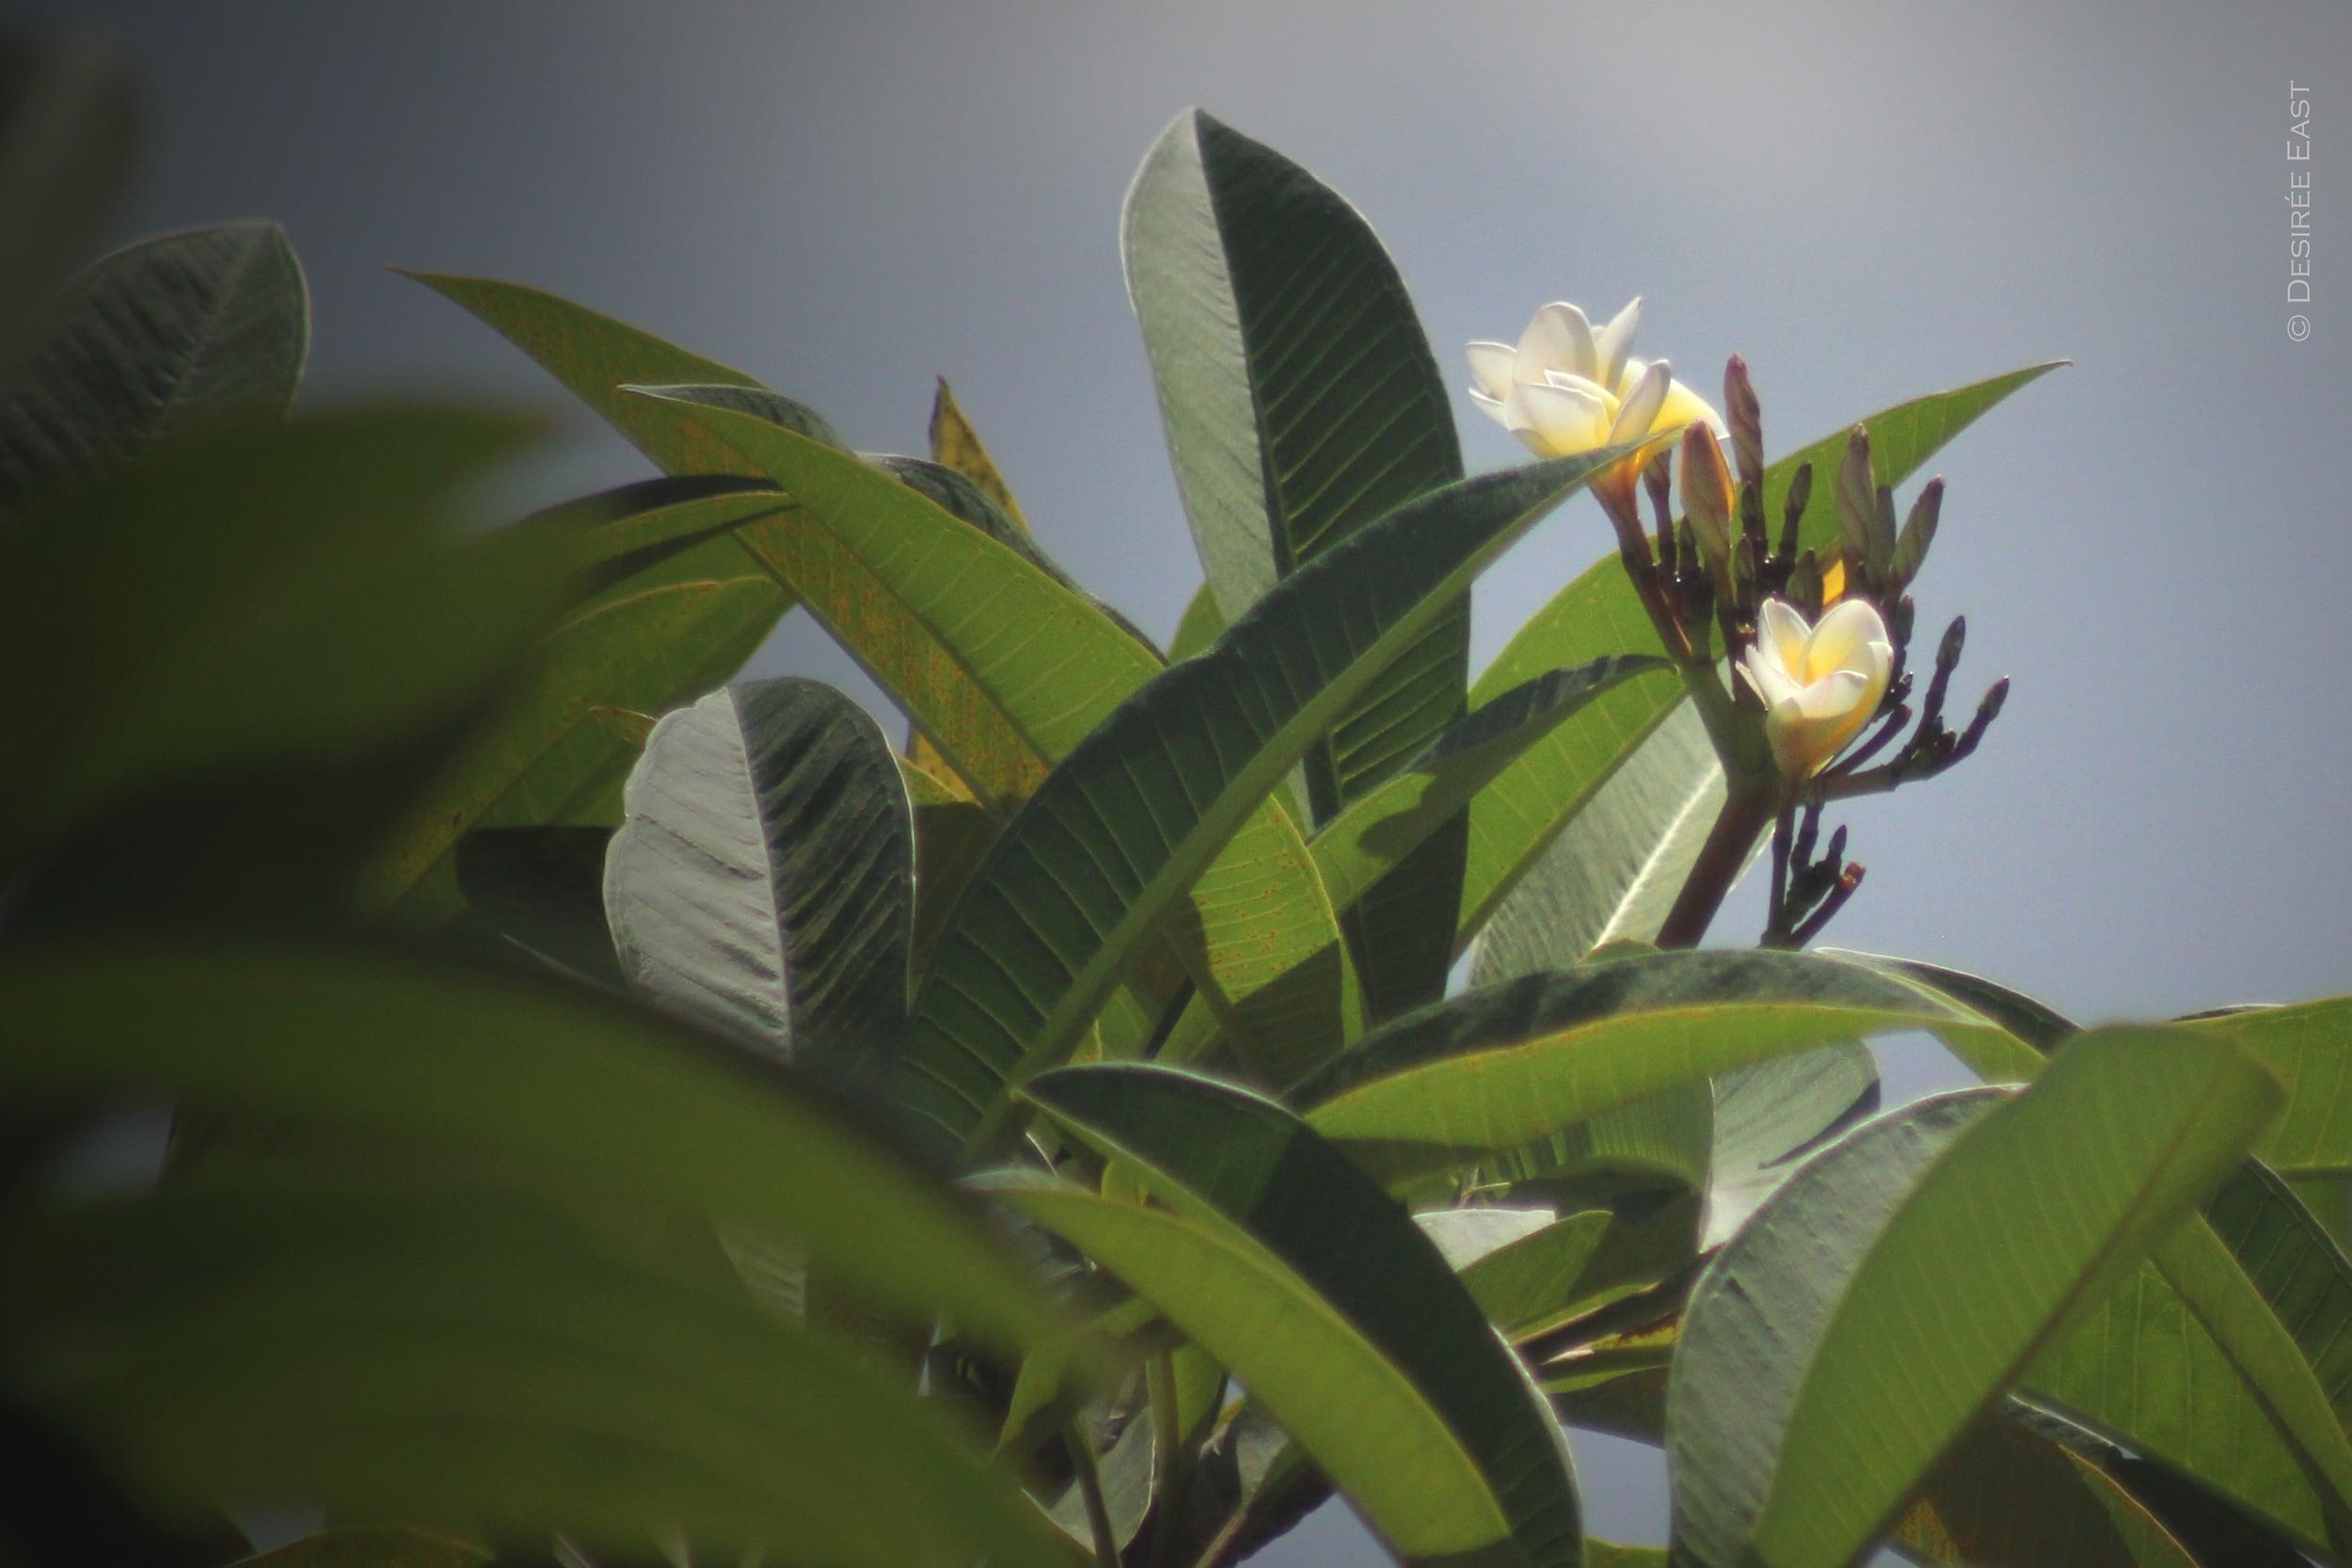 plumeria blooming everywhere. bali, indonesia. photo by desiree east